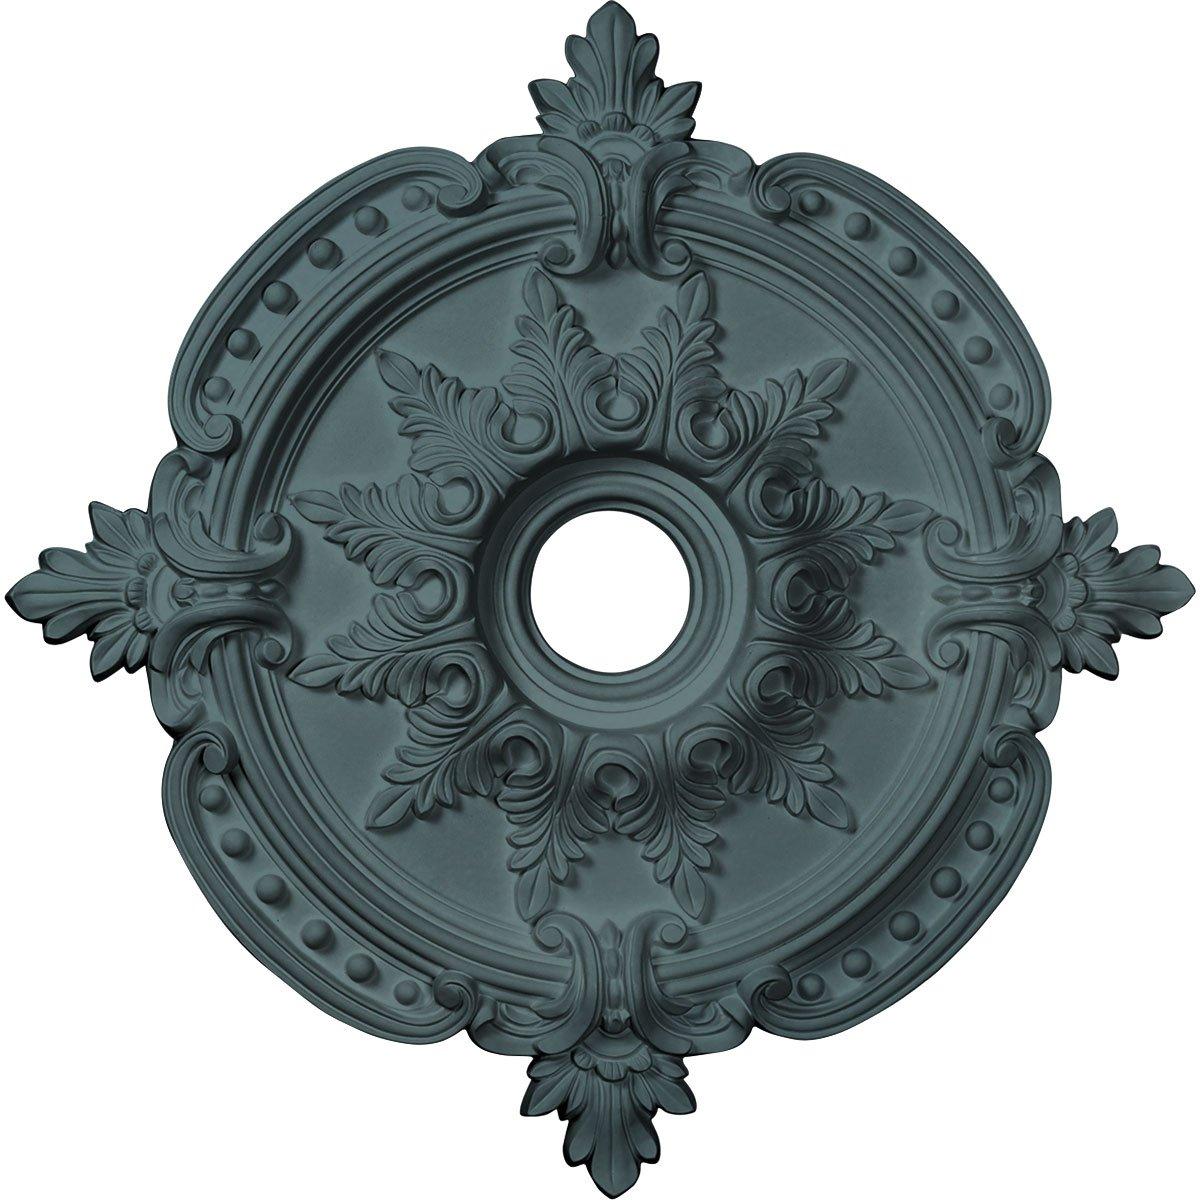 Ekena Millwork CM28BEAMF 28-3/8'' x 4-1/2'' x 1-5/8'' Benson Classic Ceiling Medallion, Americana